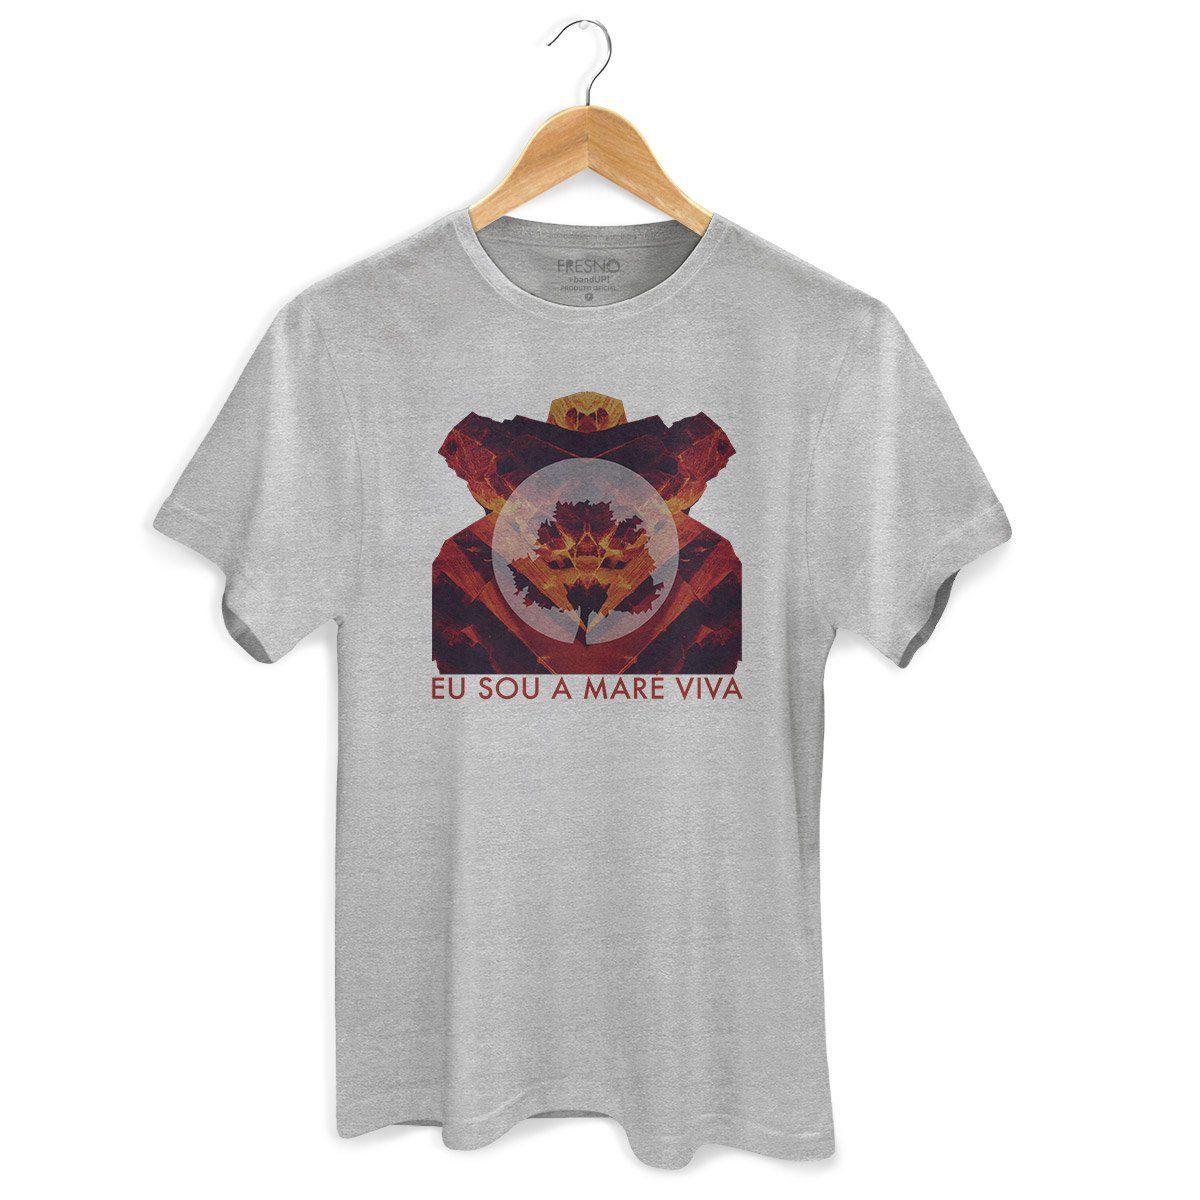 Camiseta Masculina Fresno - À Prova de Balas